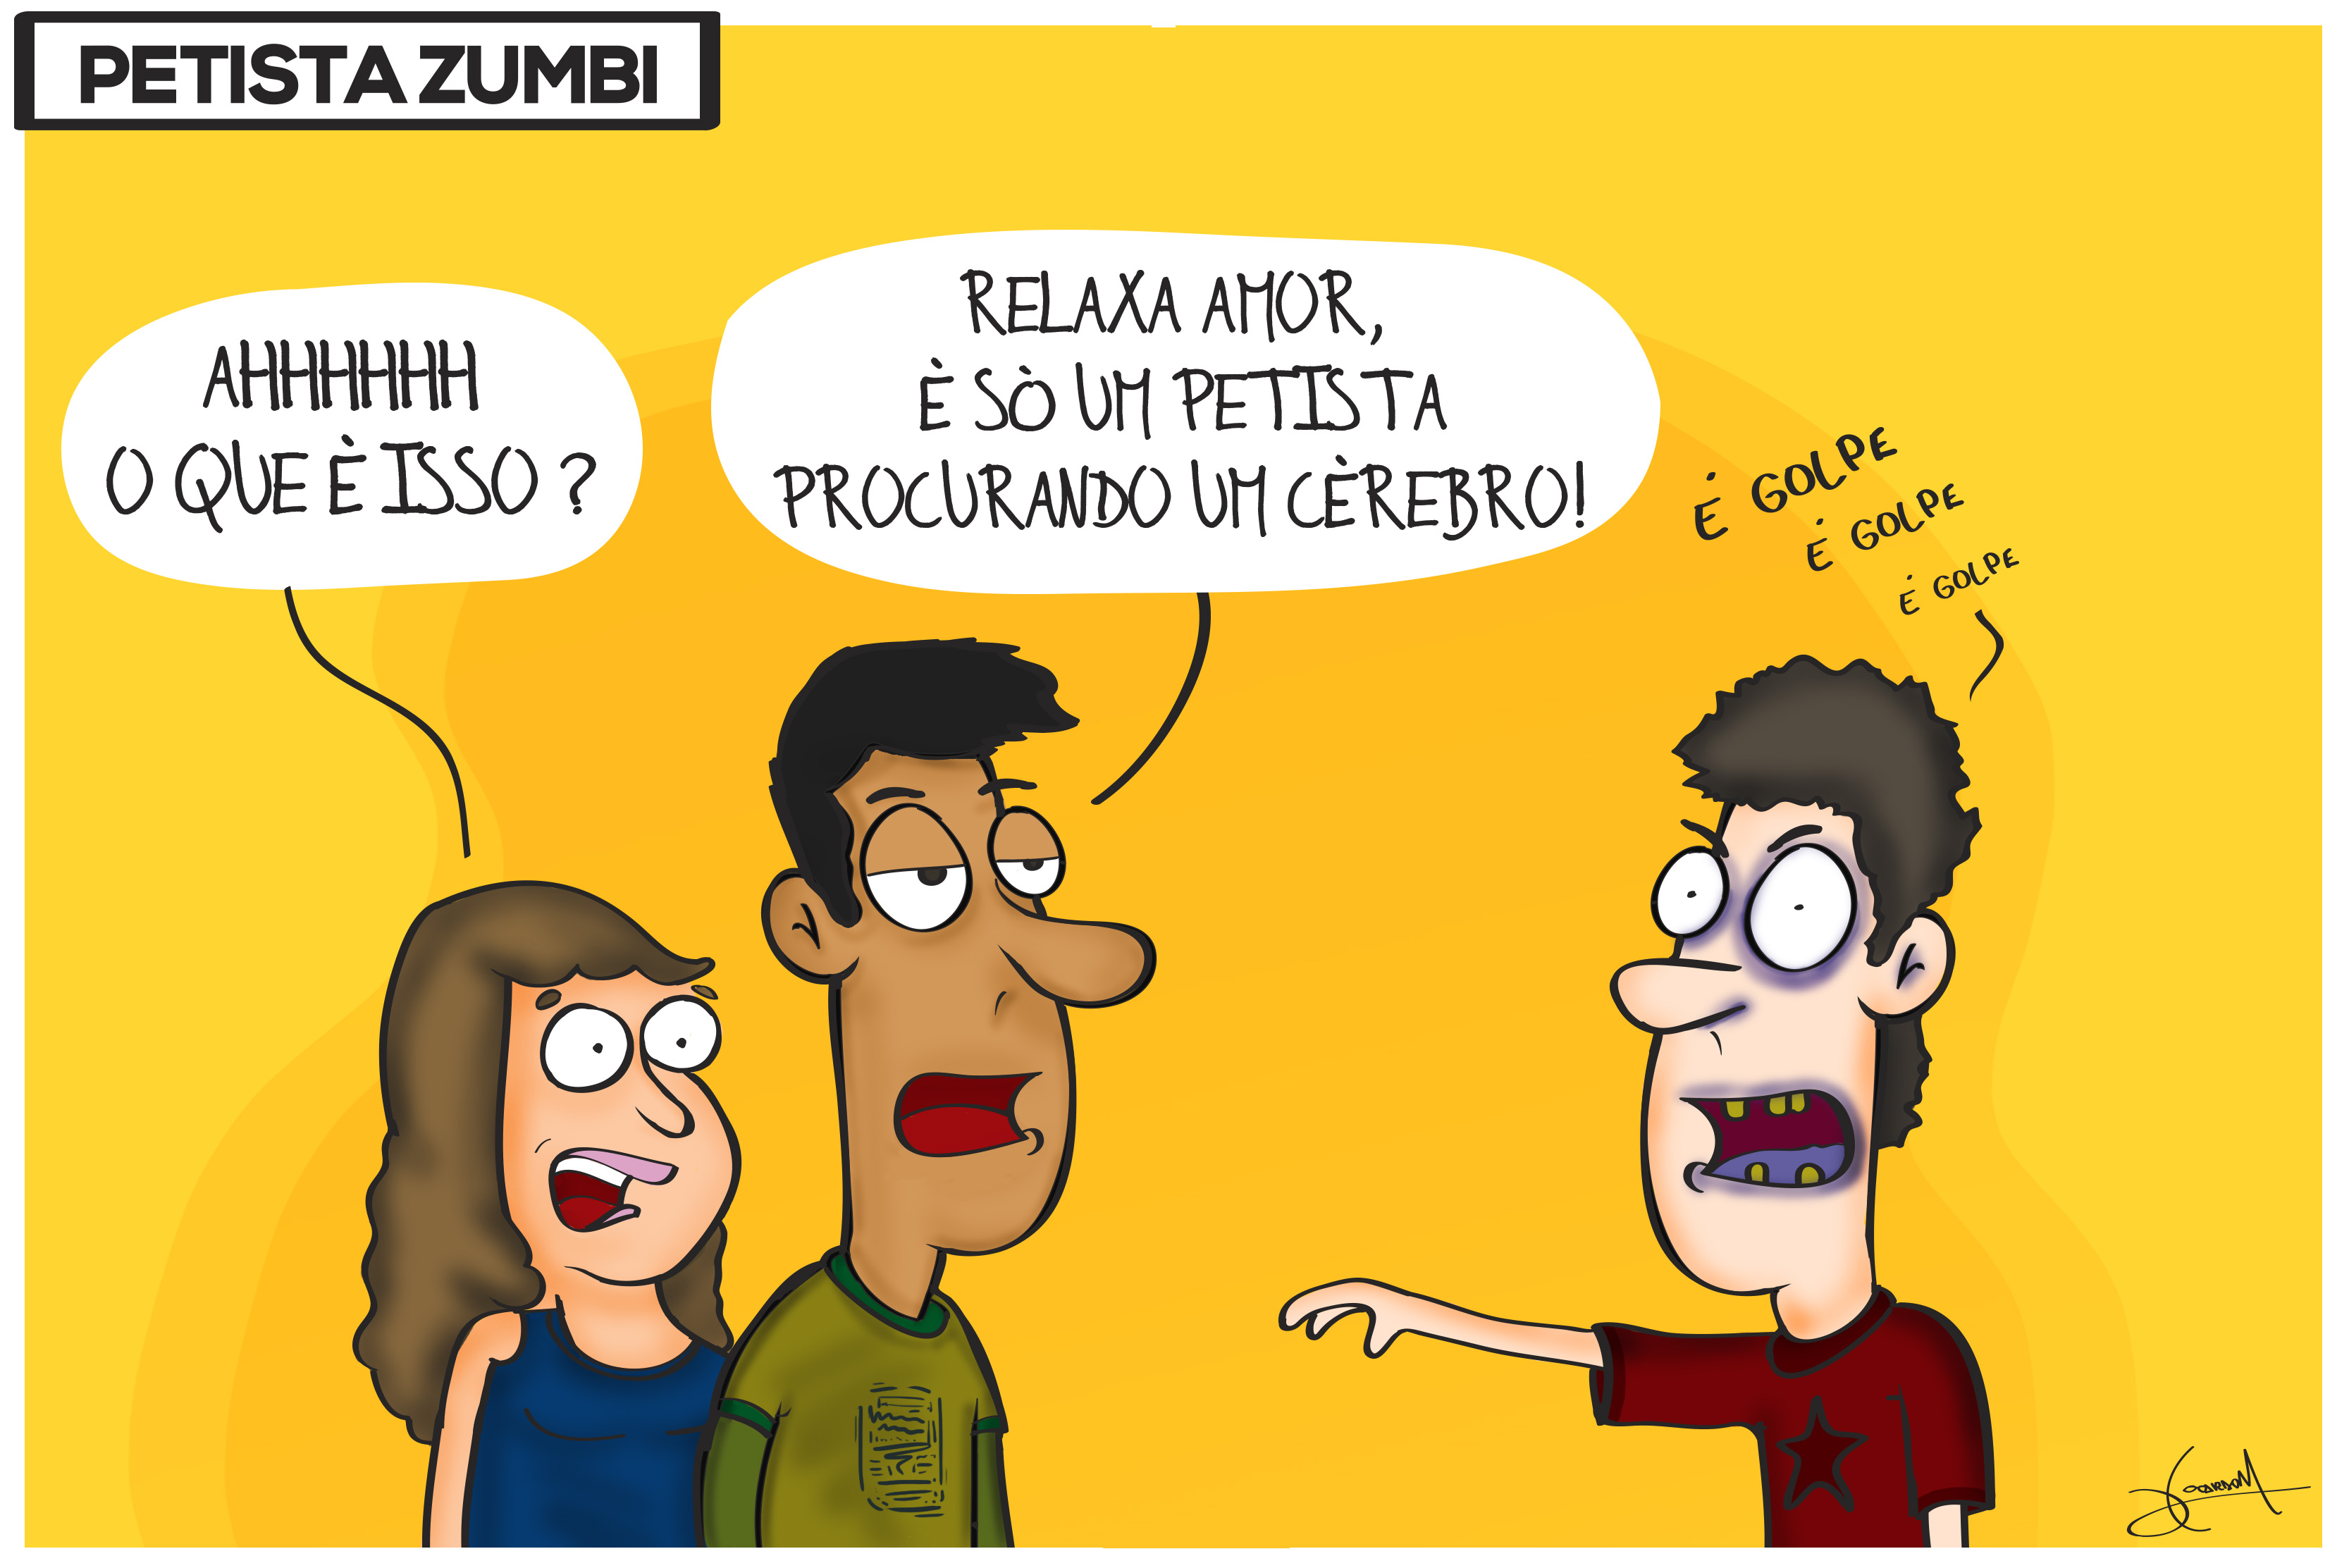 charge-petista-zumbi